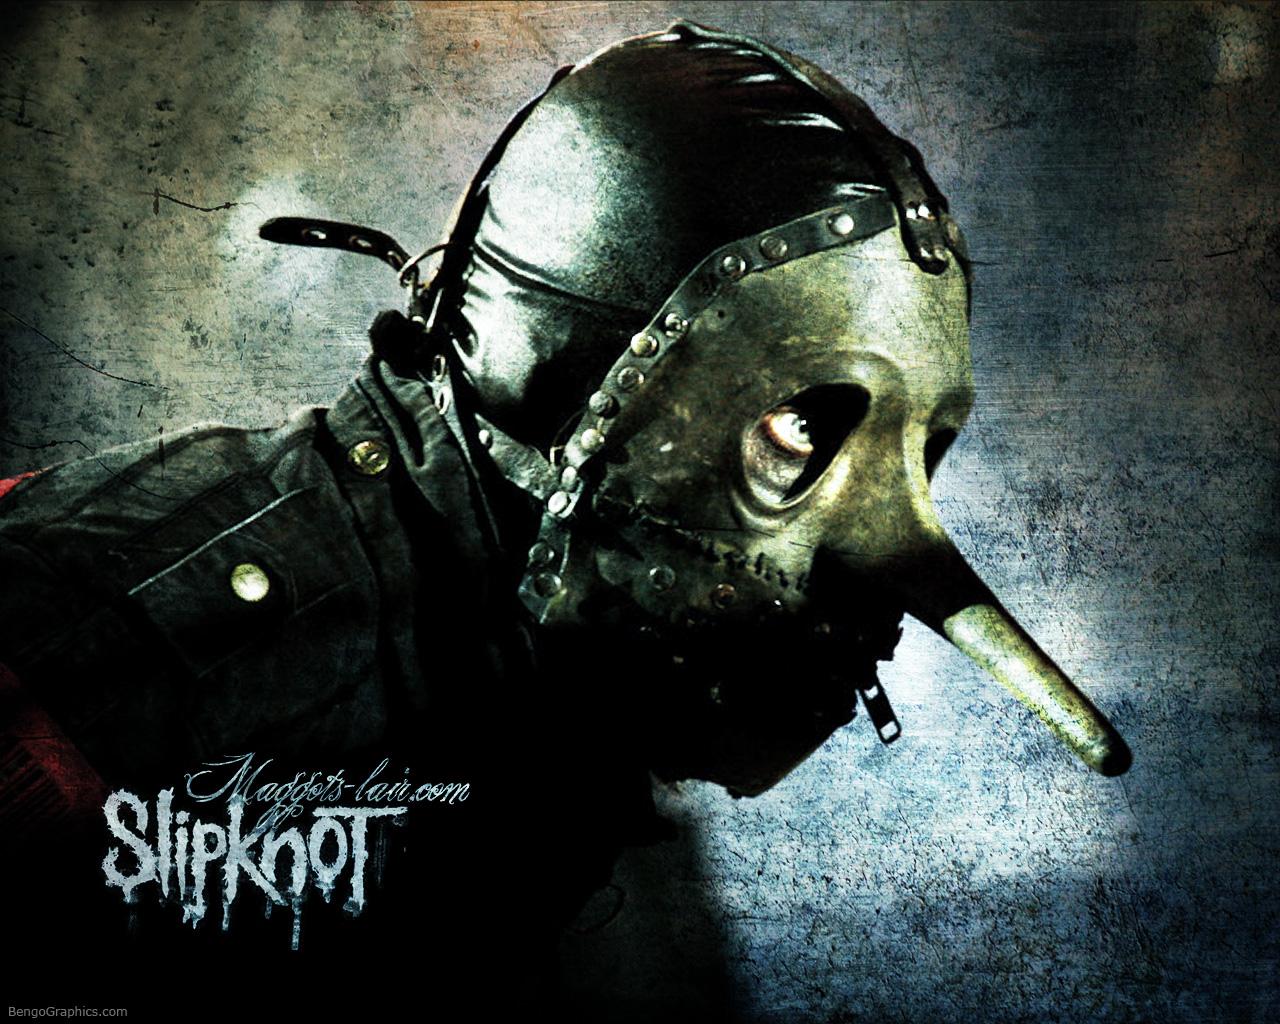 Chris_Slipknot_by_bengo_matus.jpg